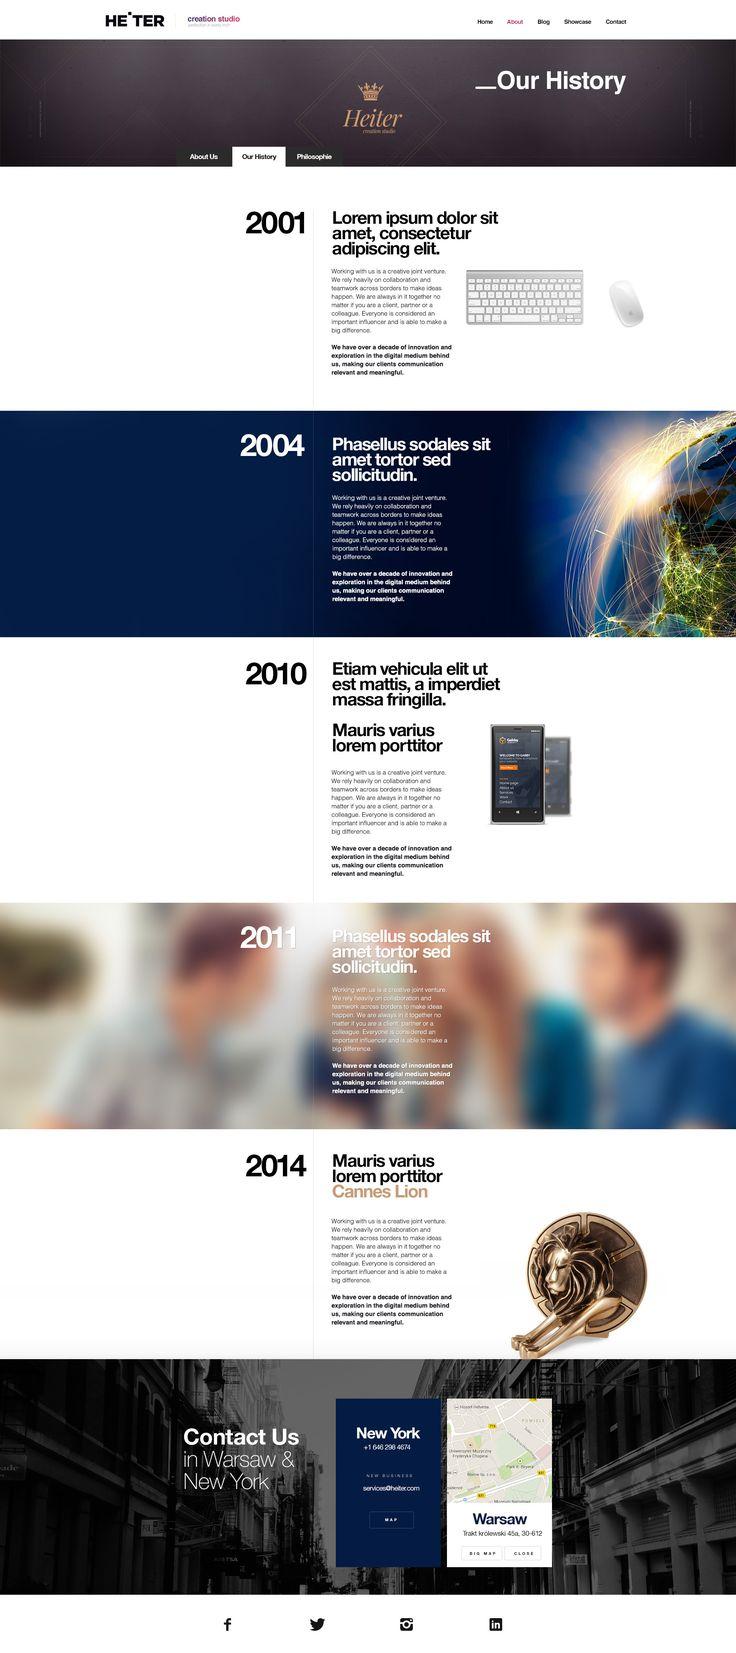 Heiter - Fresh Design. Excellent for Business (Business) more on http://themeforest.net/?ref=Vision7Studio